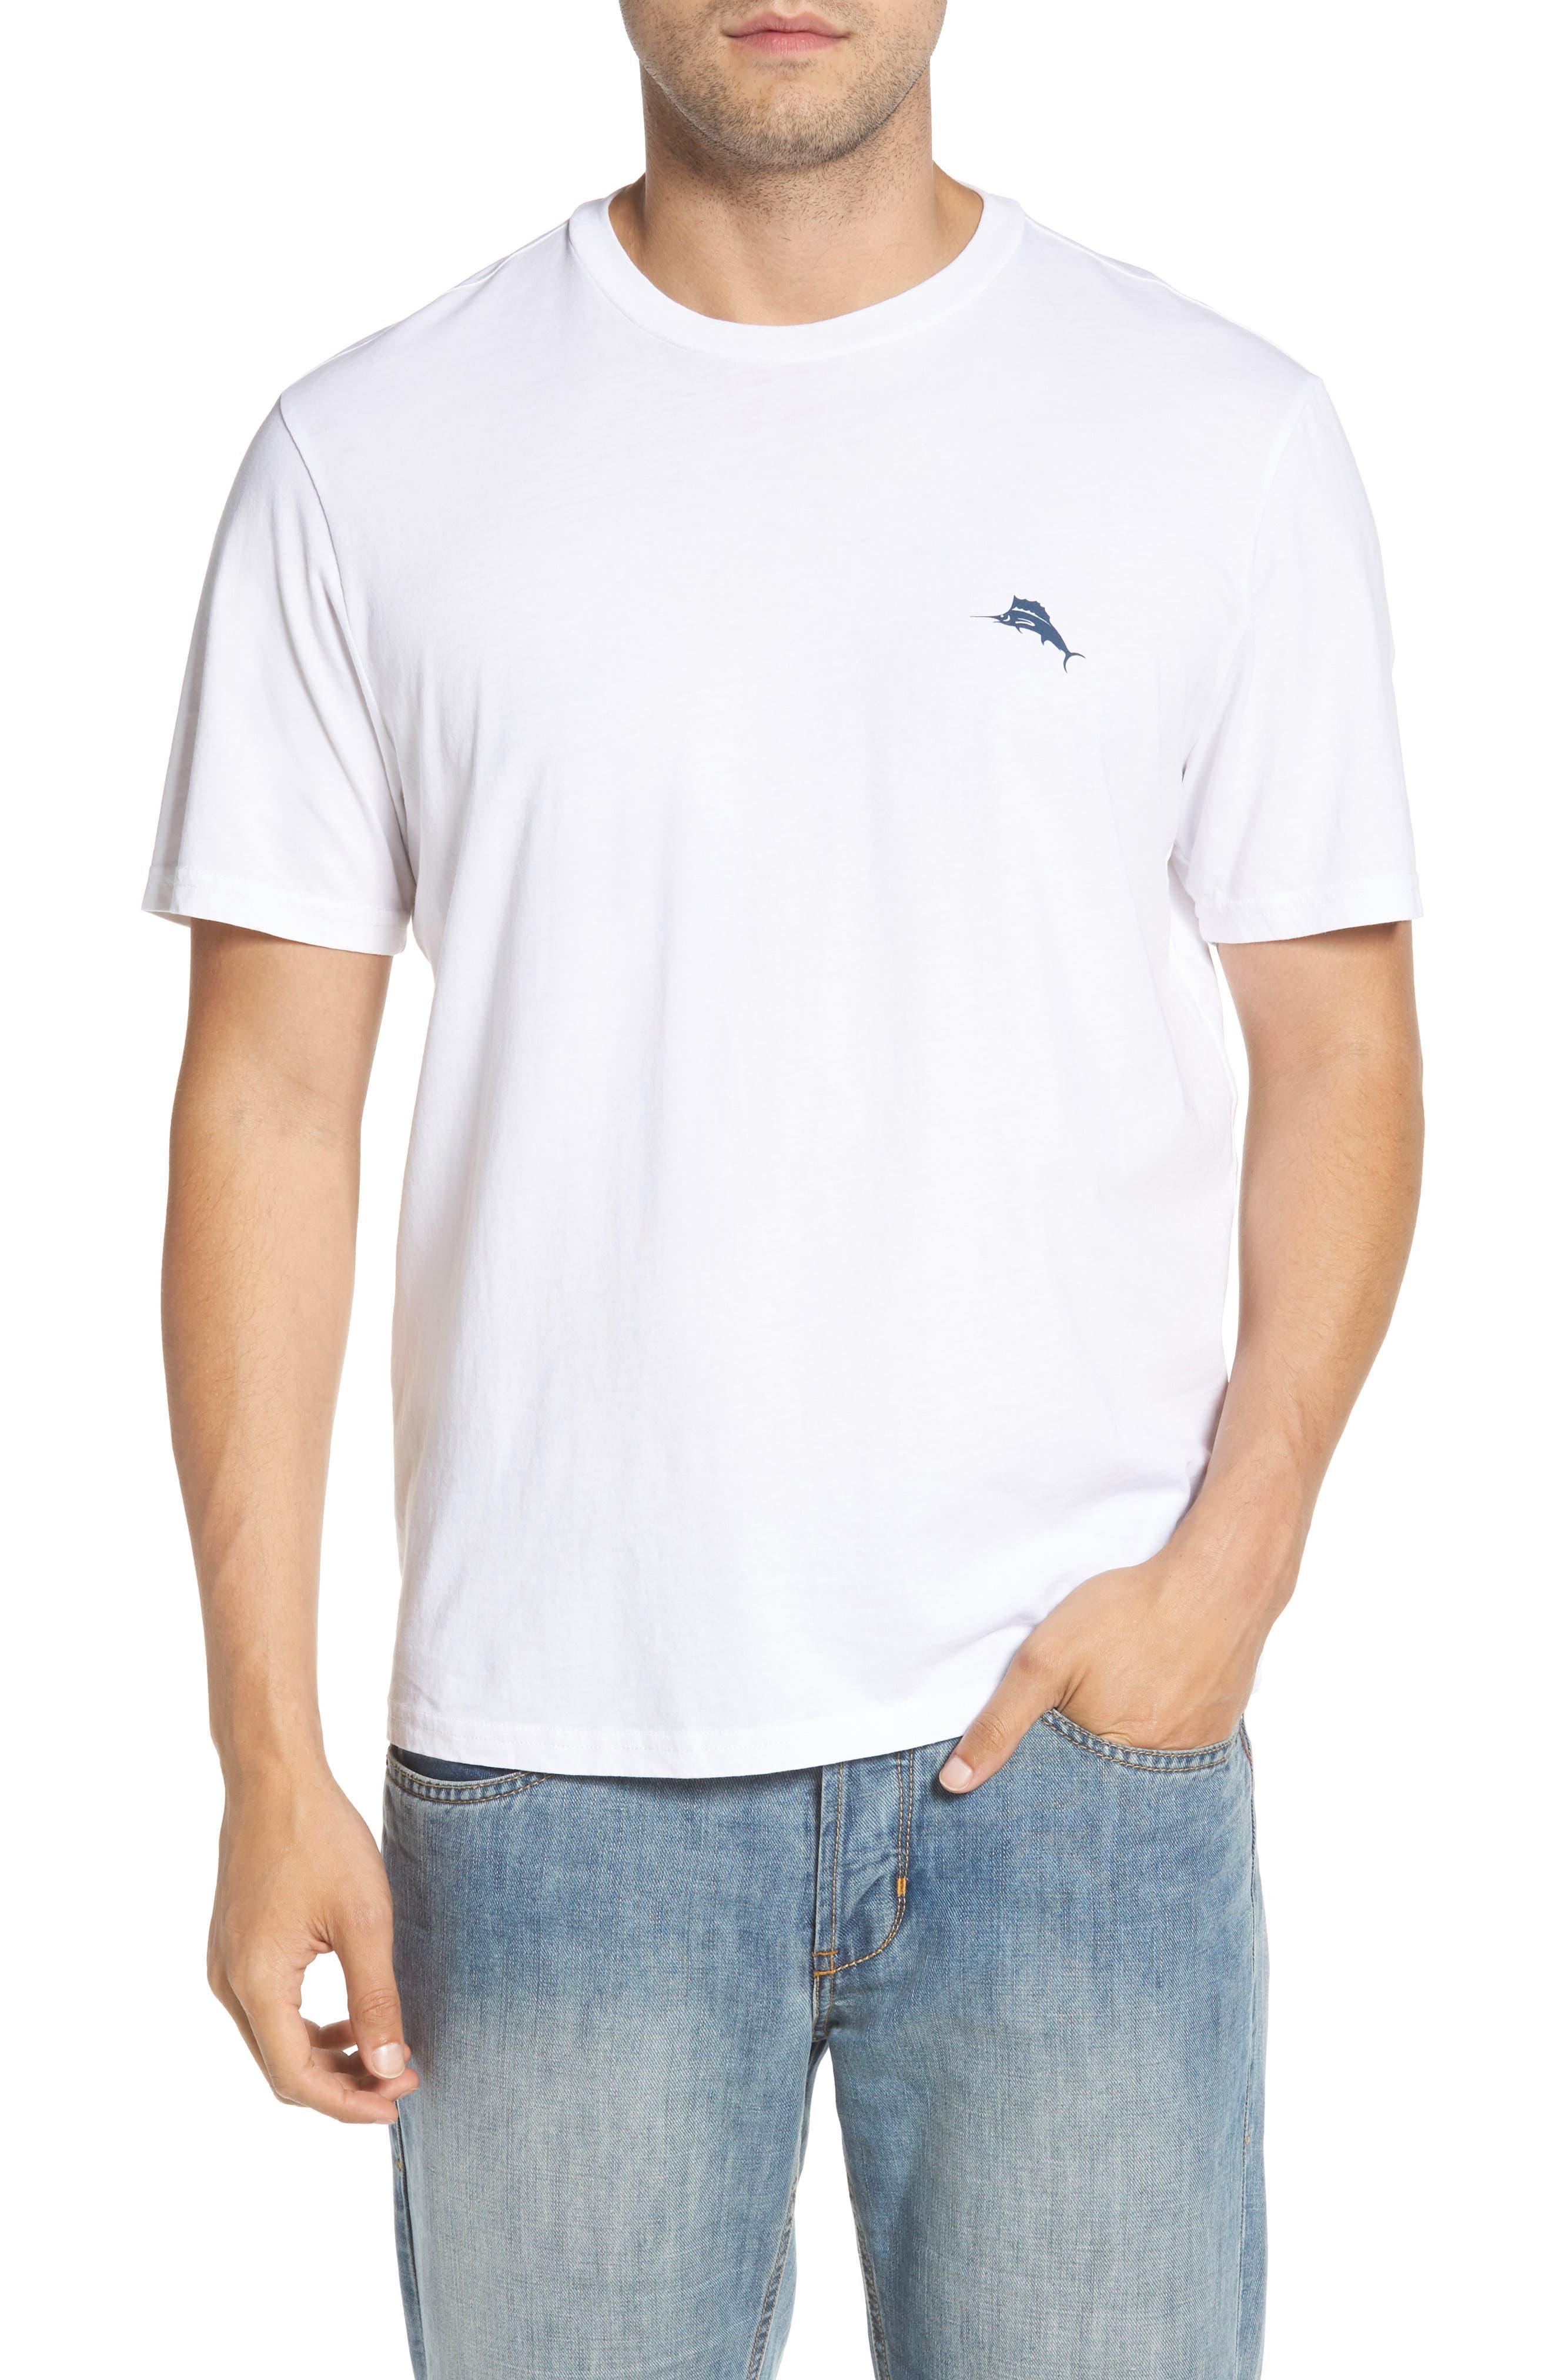 Diamond Cove T-Shirt,                         Main,                         color, 100